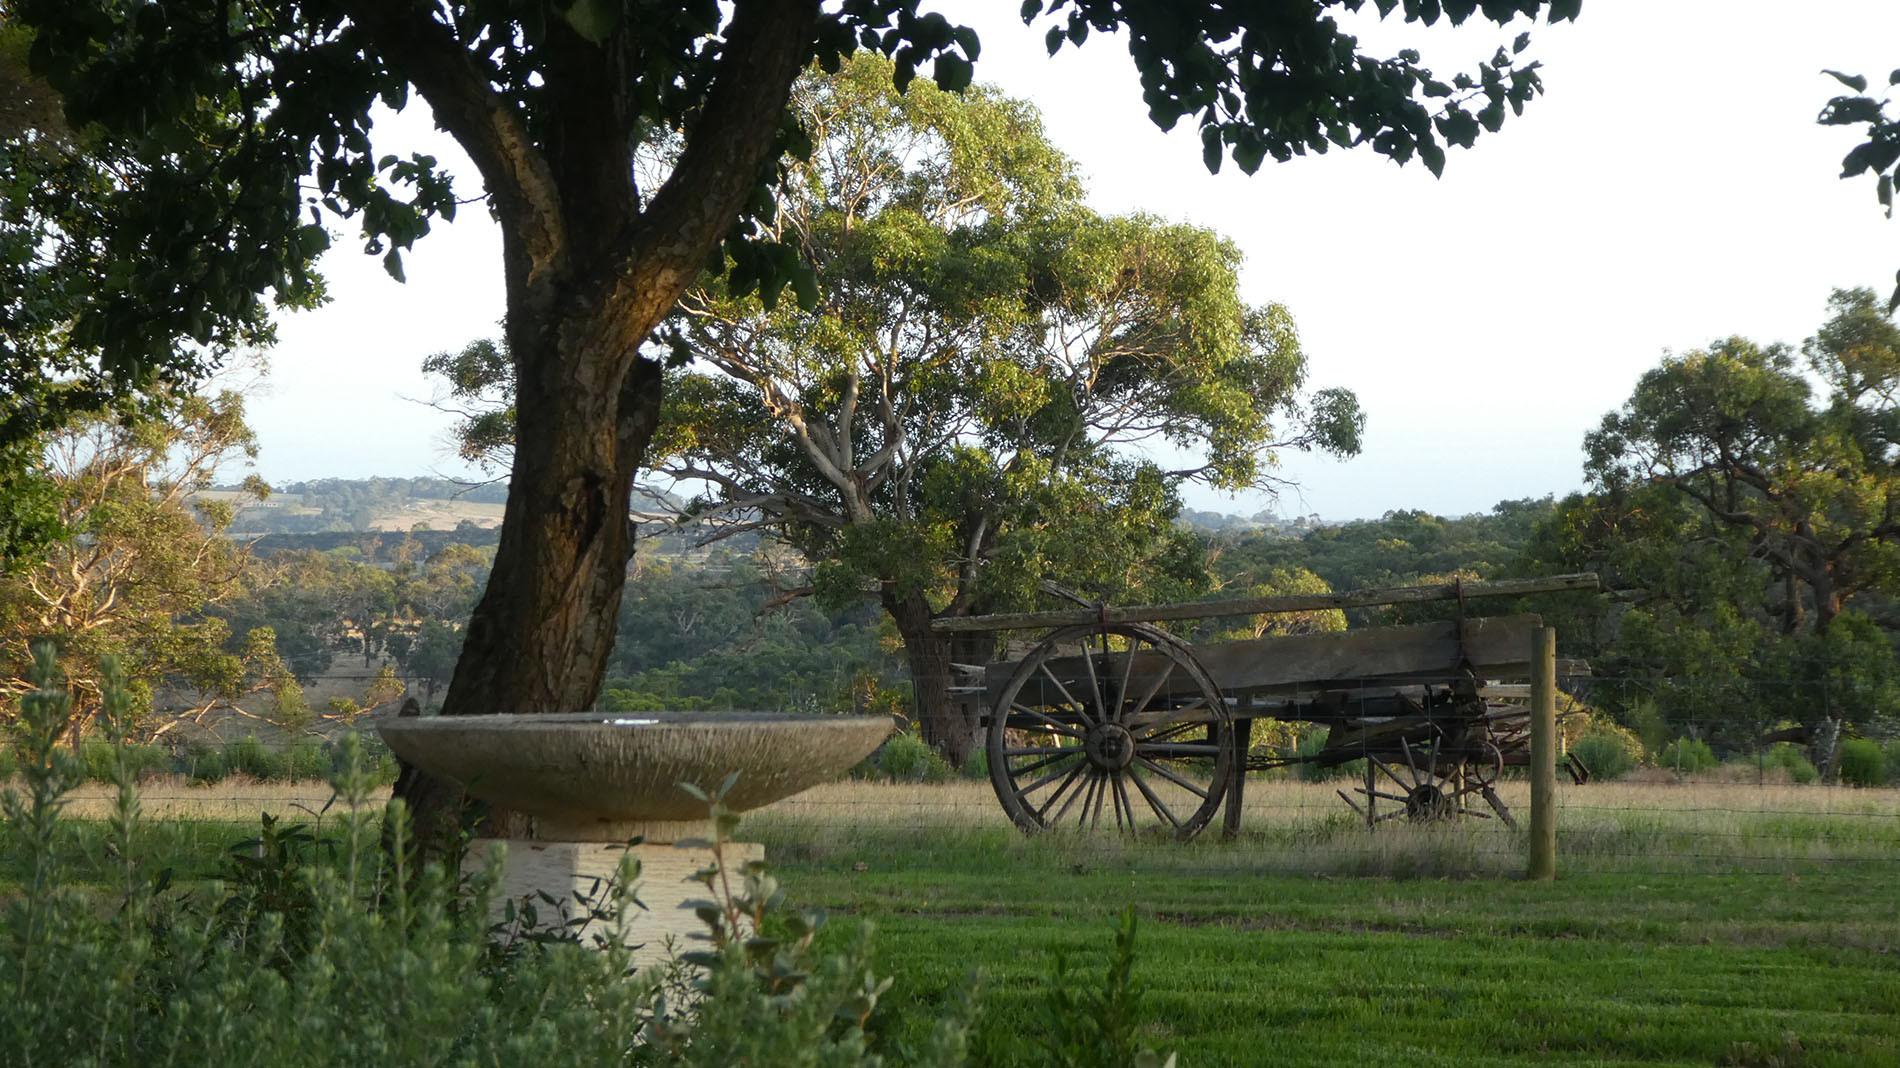 Birdbath and old wagon